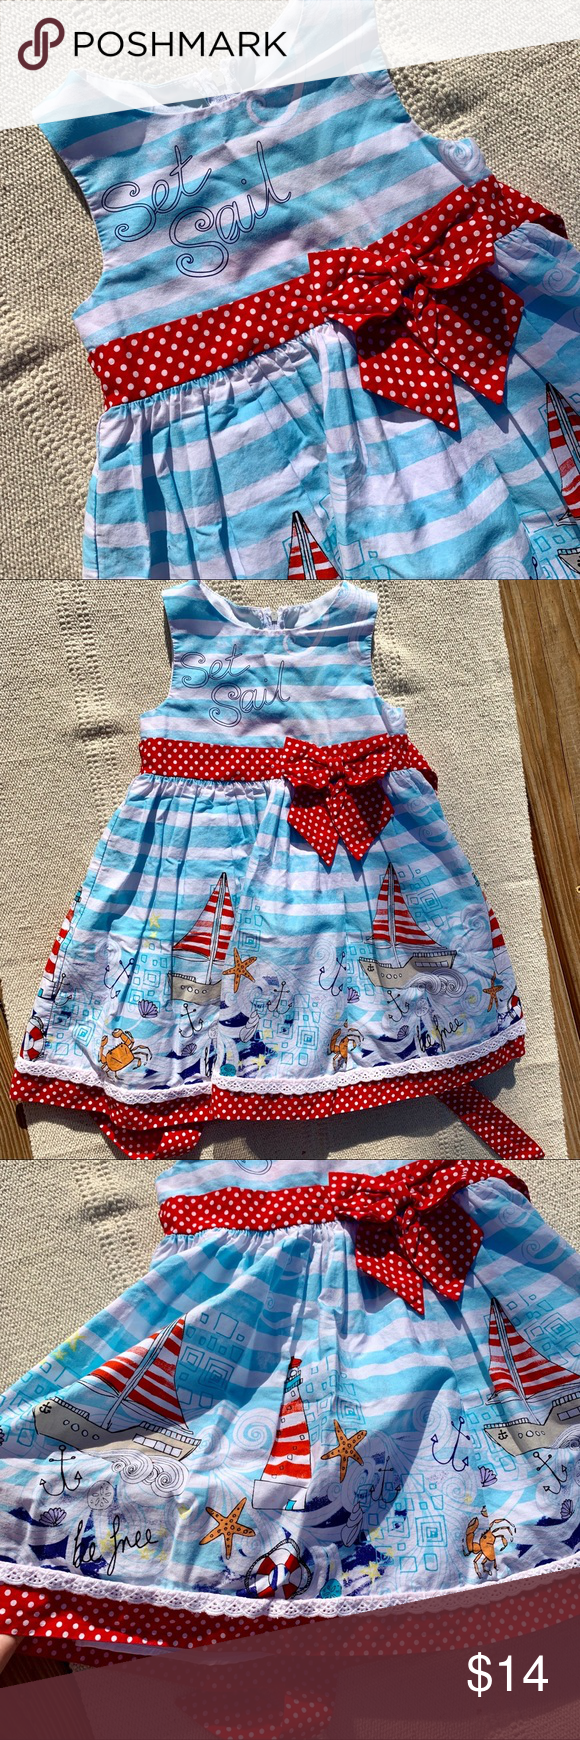 H P Set Sail Toddler 3t Summer Dress Summer Dresses Clothes Design Dresses [ 1740 x 580 Pixel ]